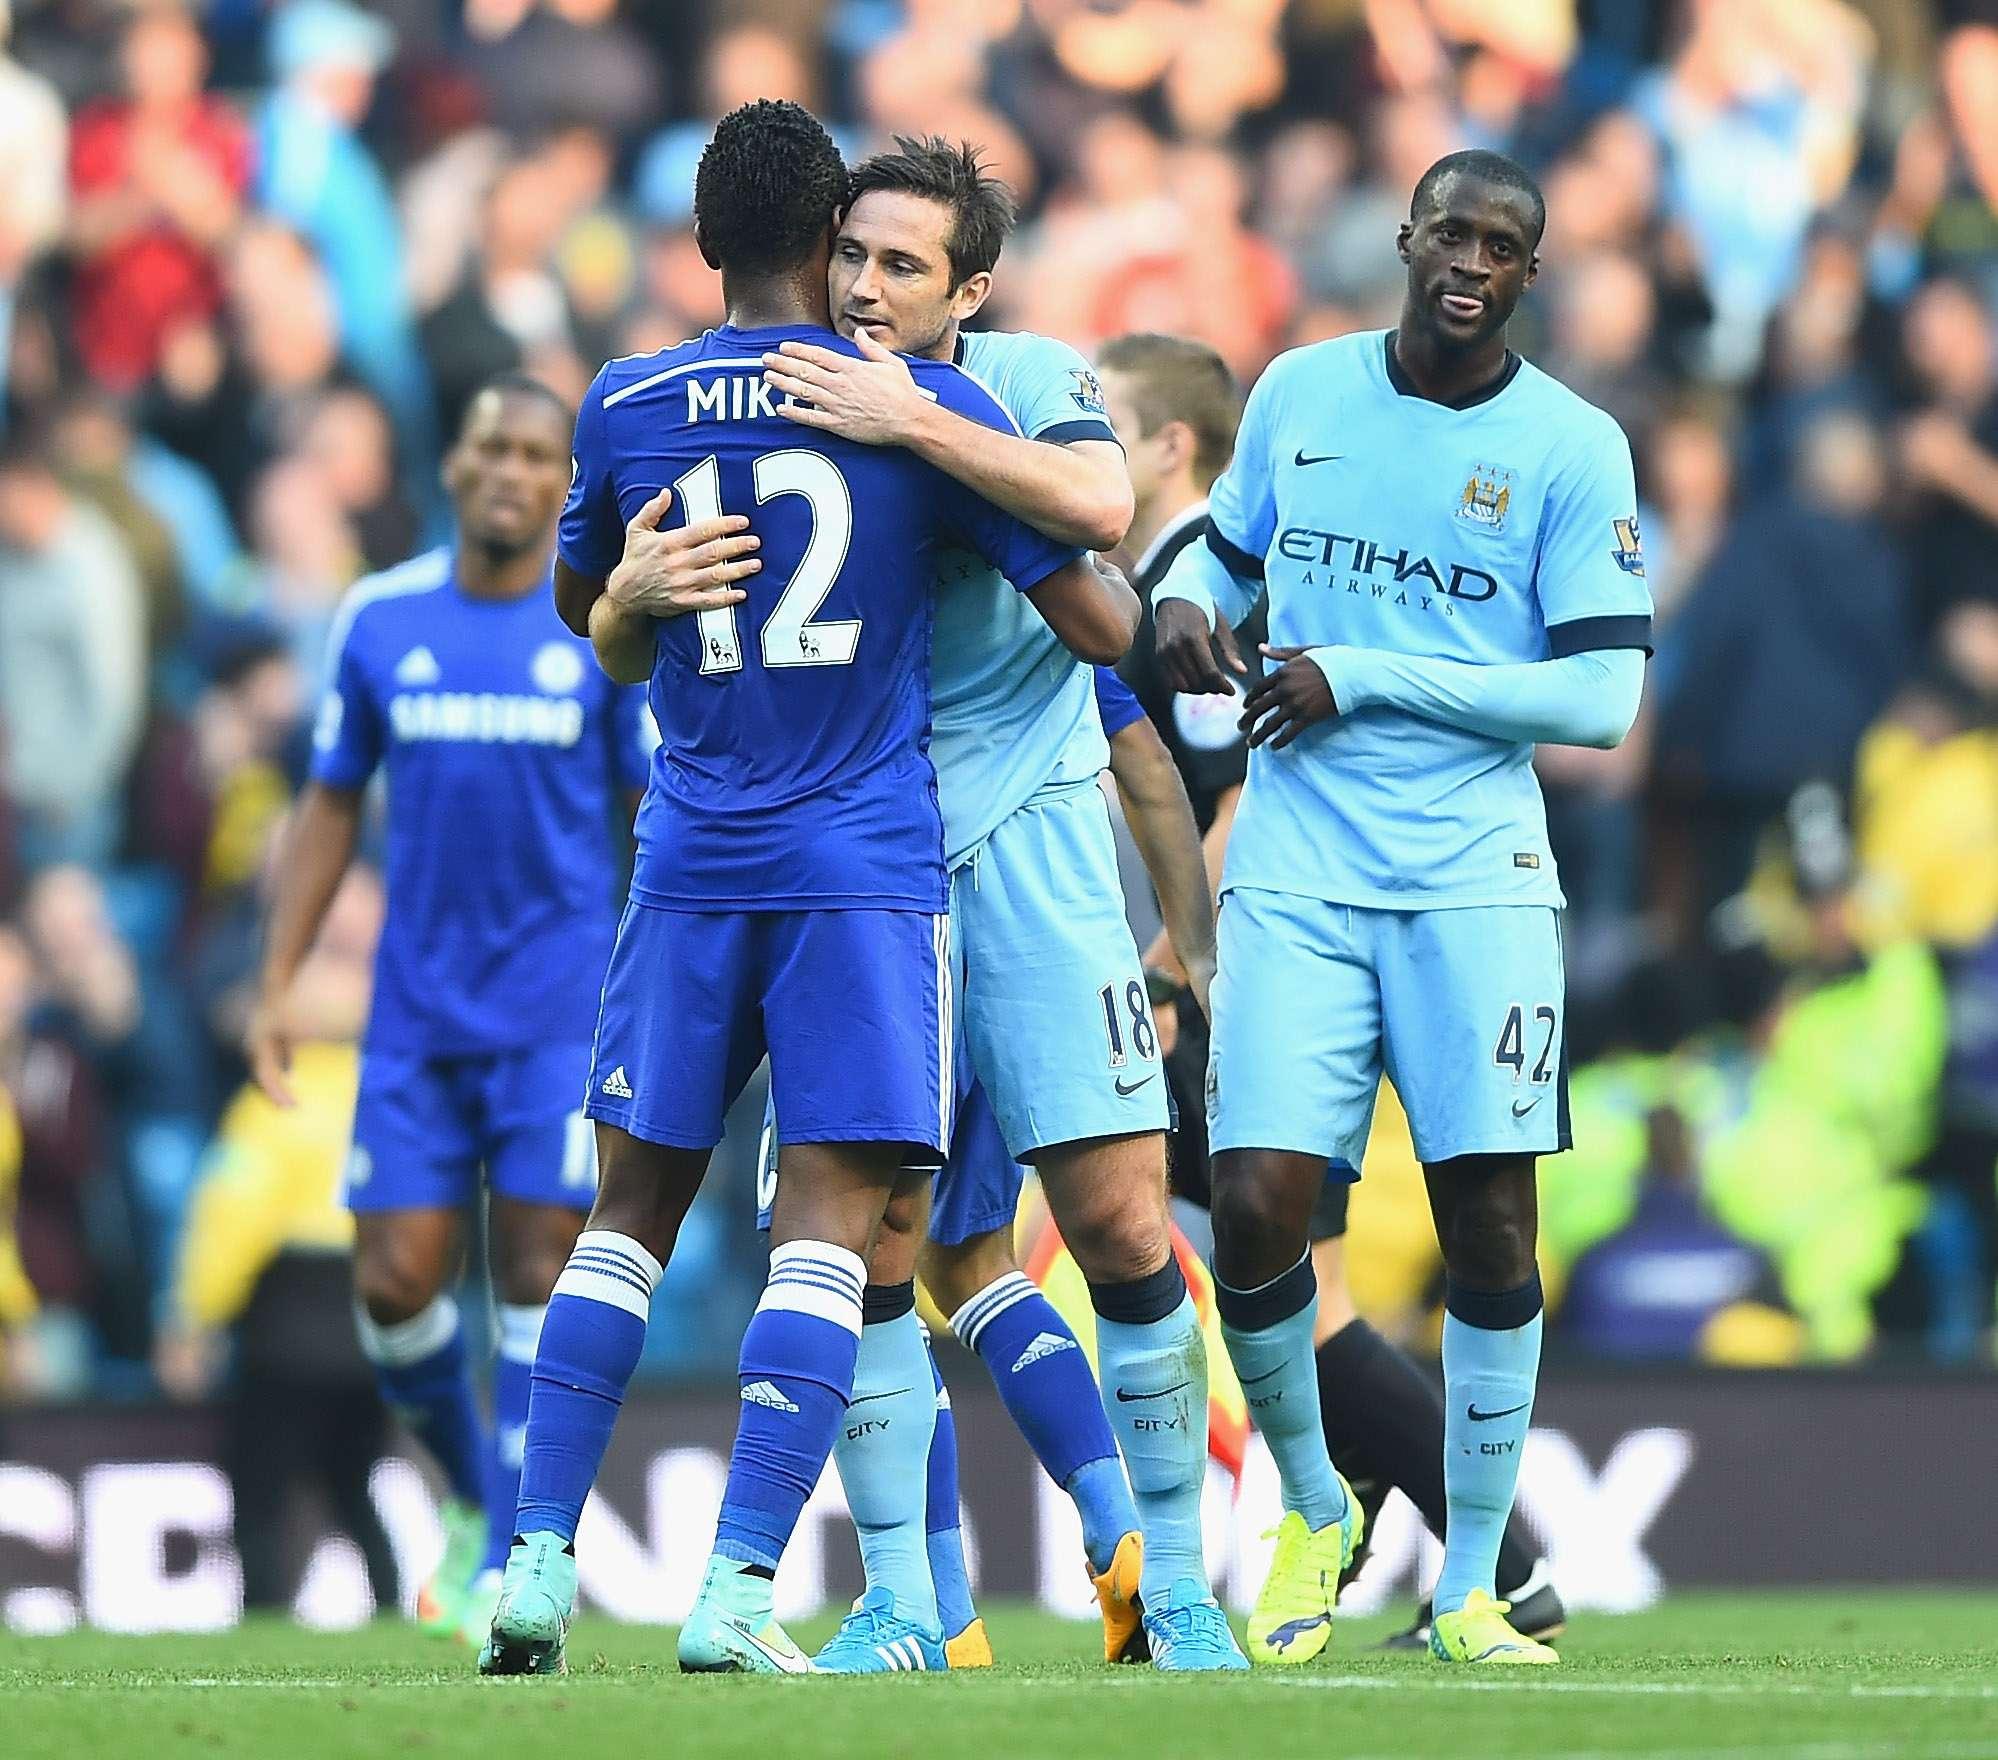 Lampard le anotó a su exequipo el Chelsea. Foto: Getty Images